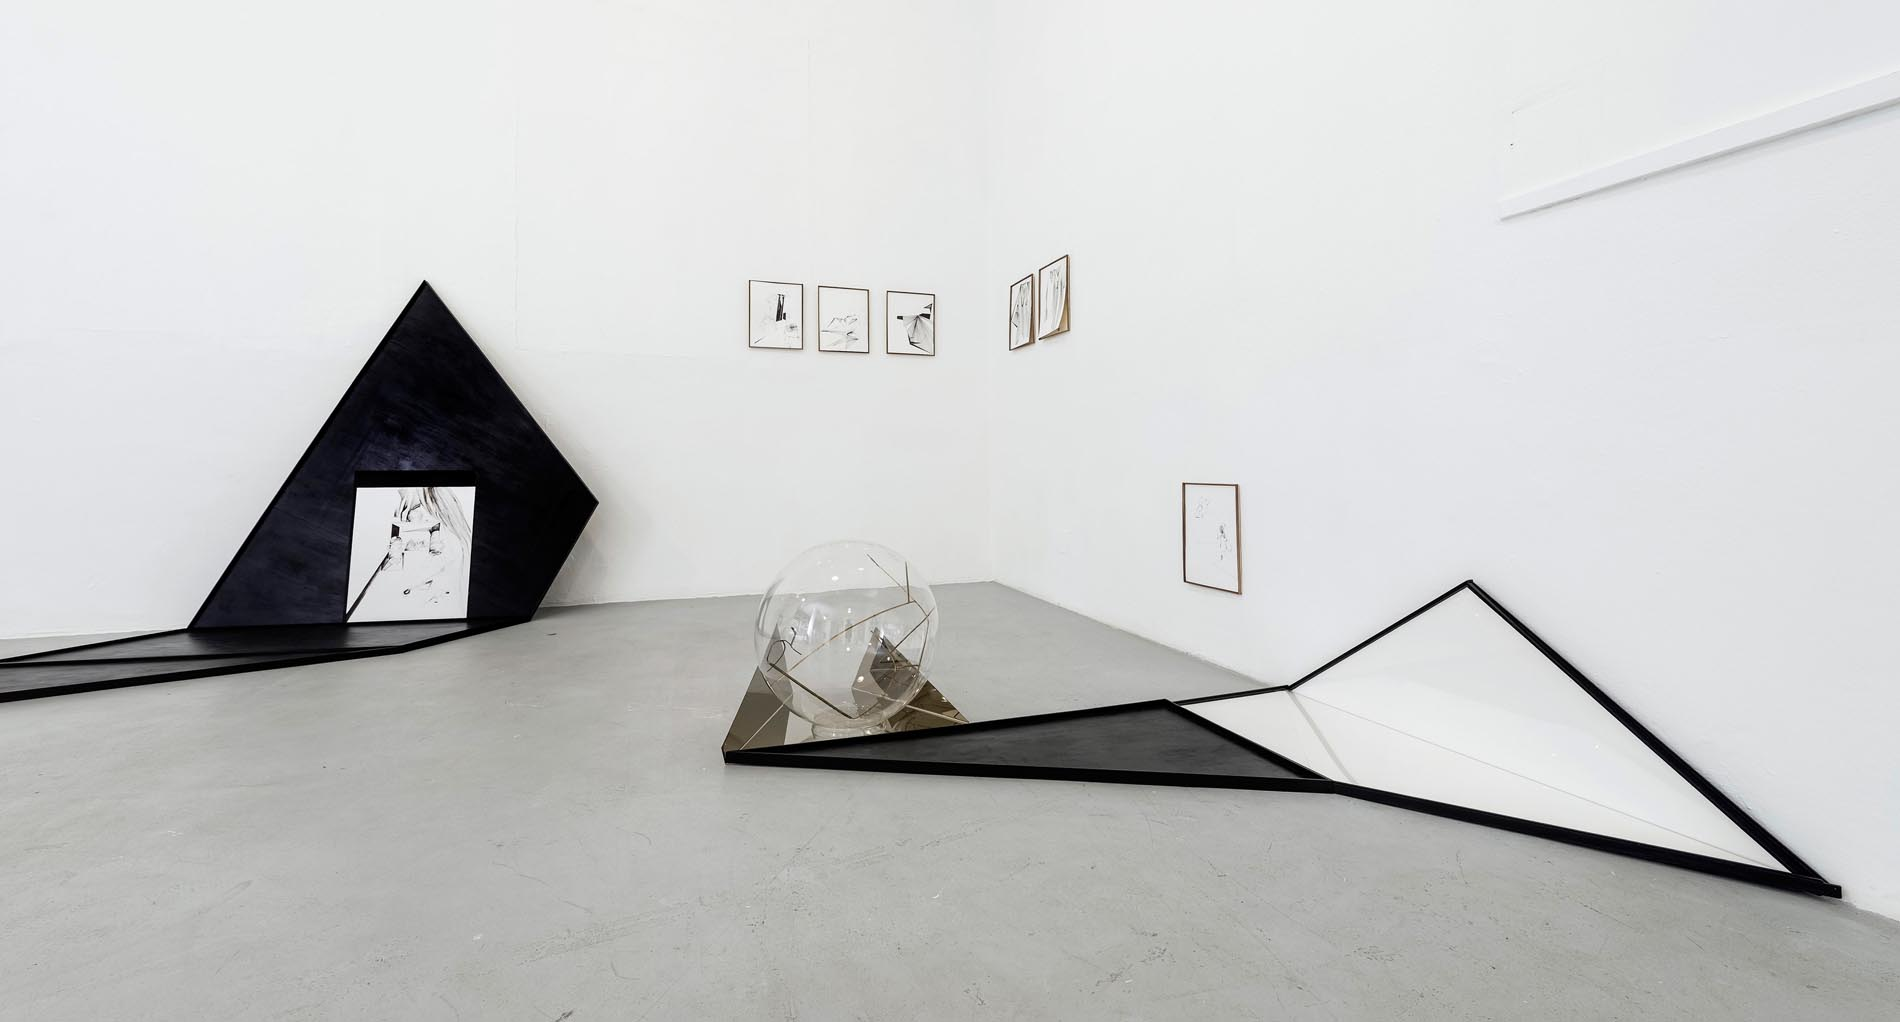 Nina Annabelle Maerkl, Frames, 2018, Installation view, welded steel, ink on paper 120 x 80 x 5 cm